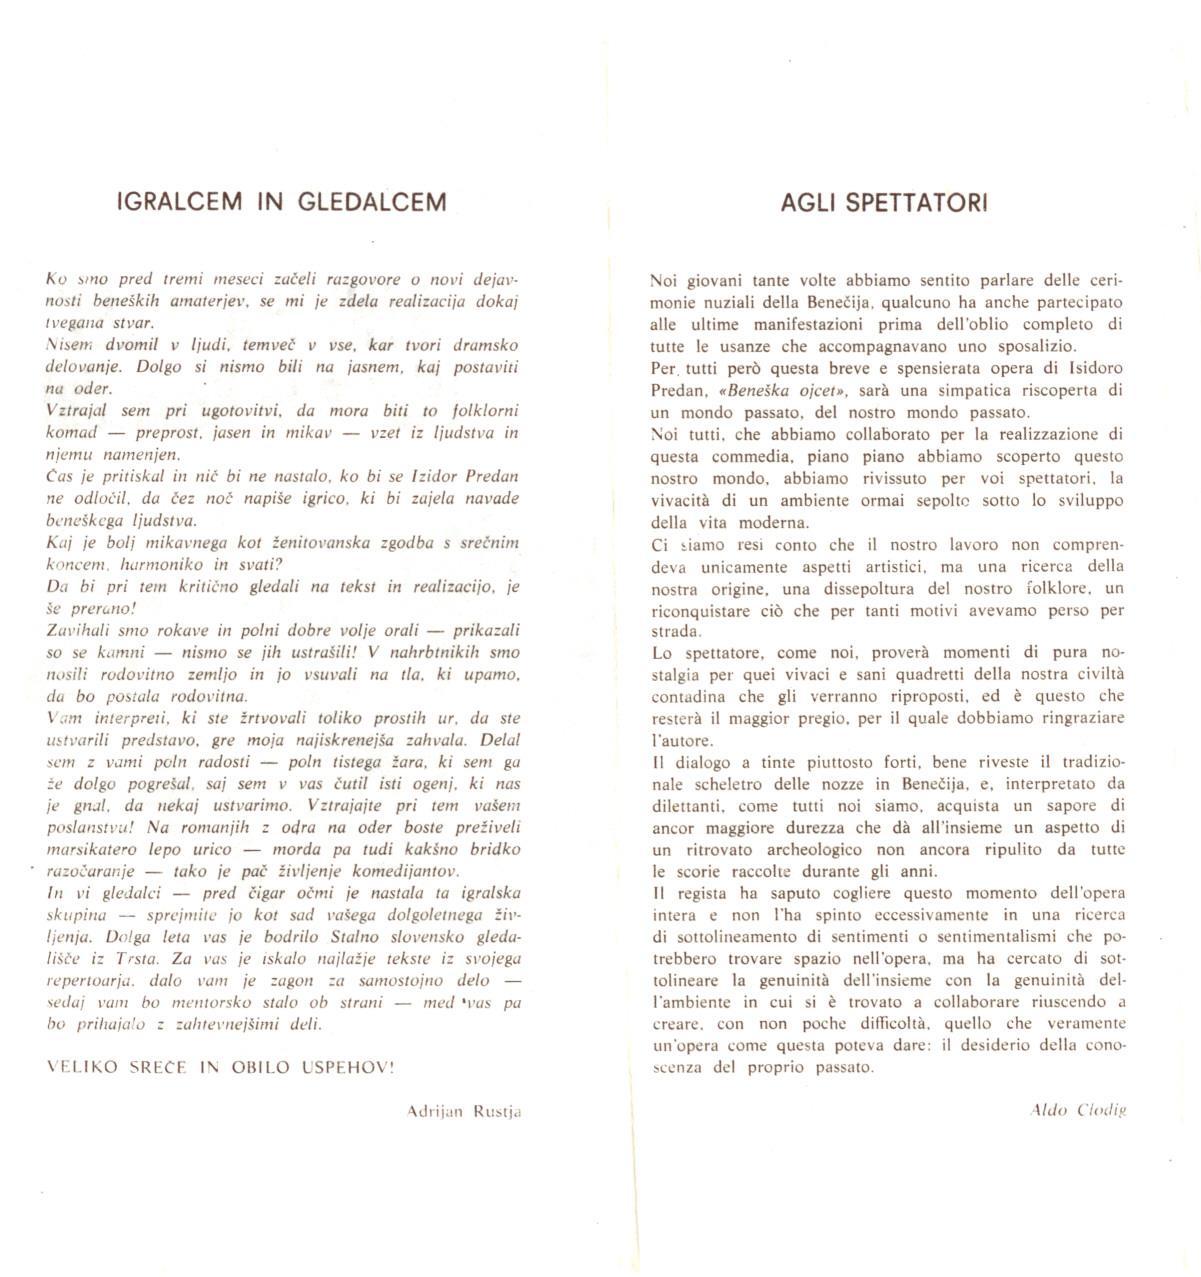 1976 - Beneska Ojcet - Vabilo 2